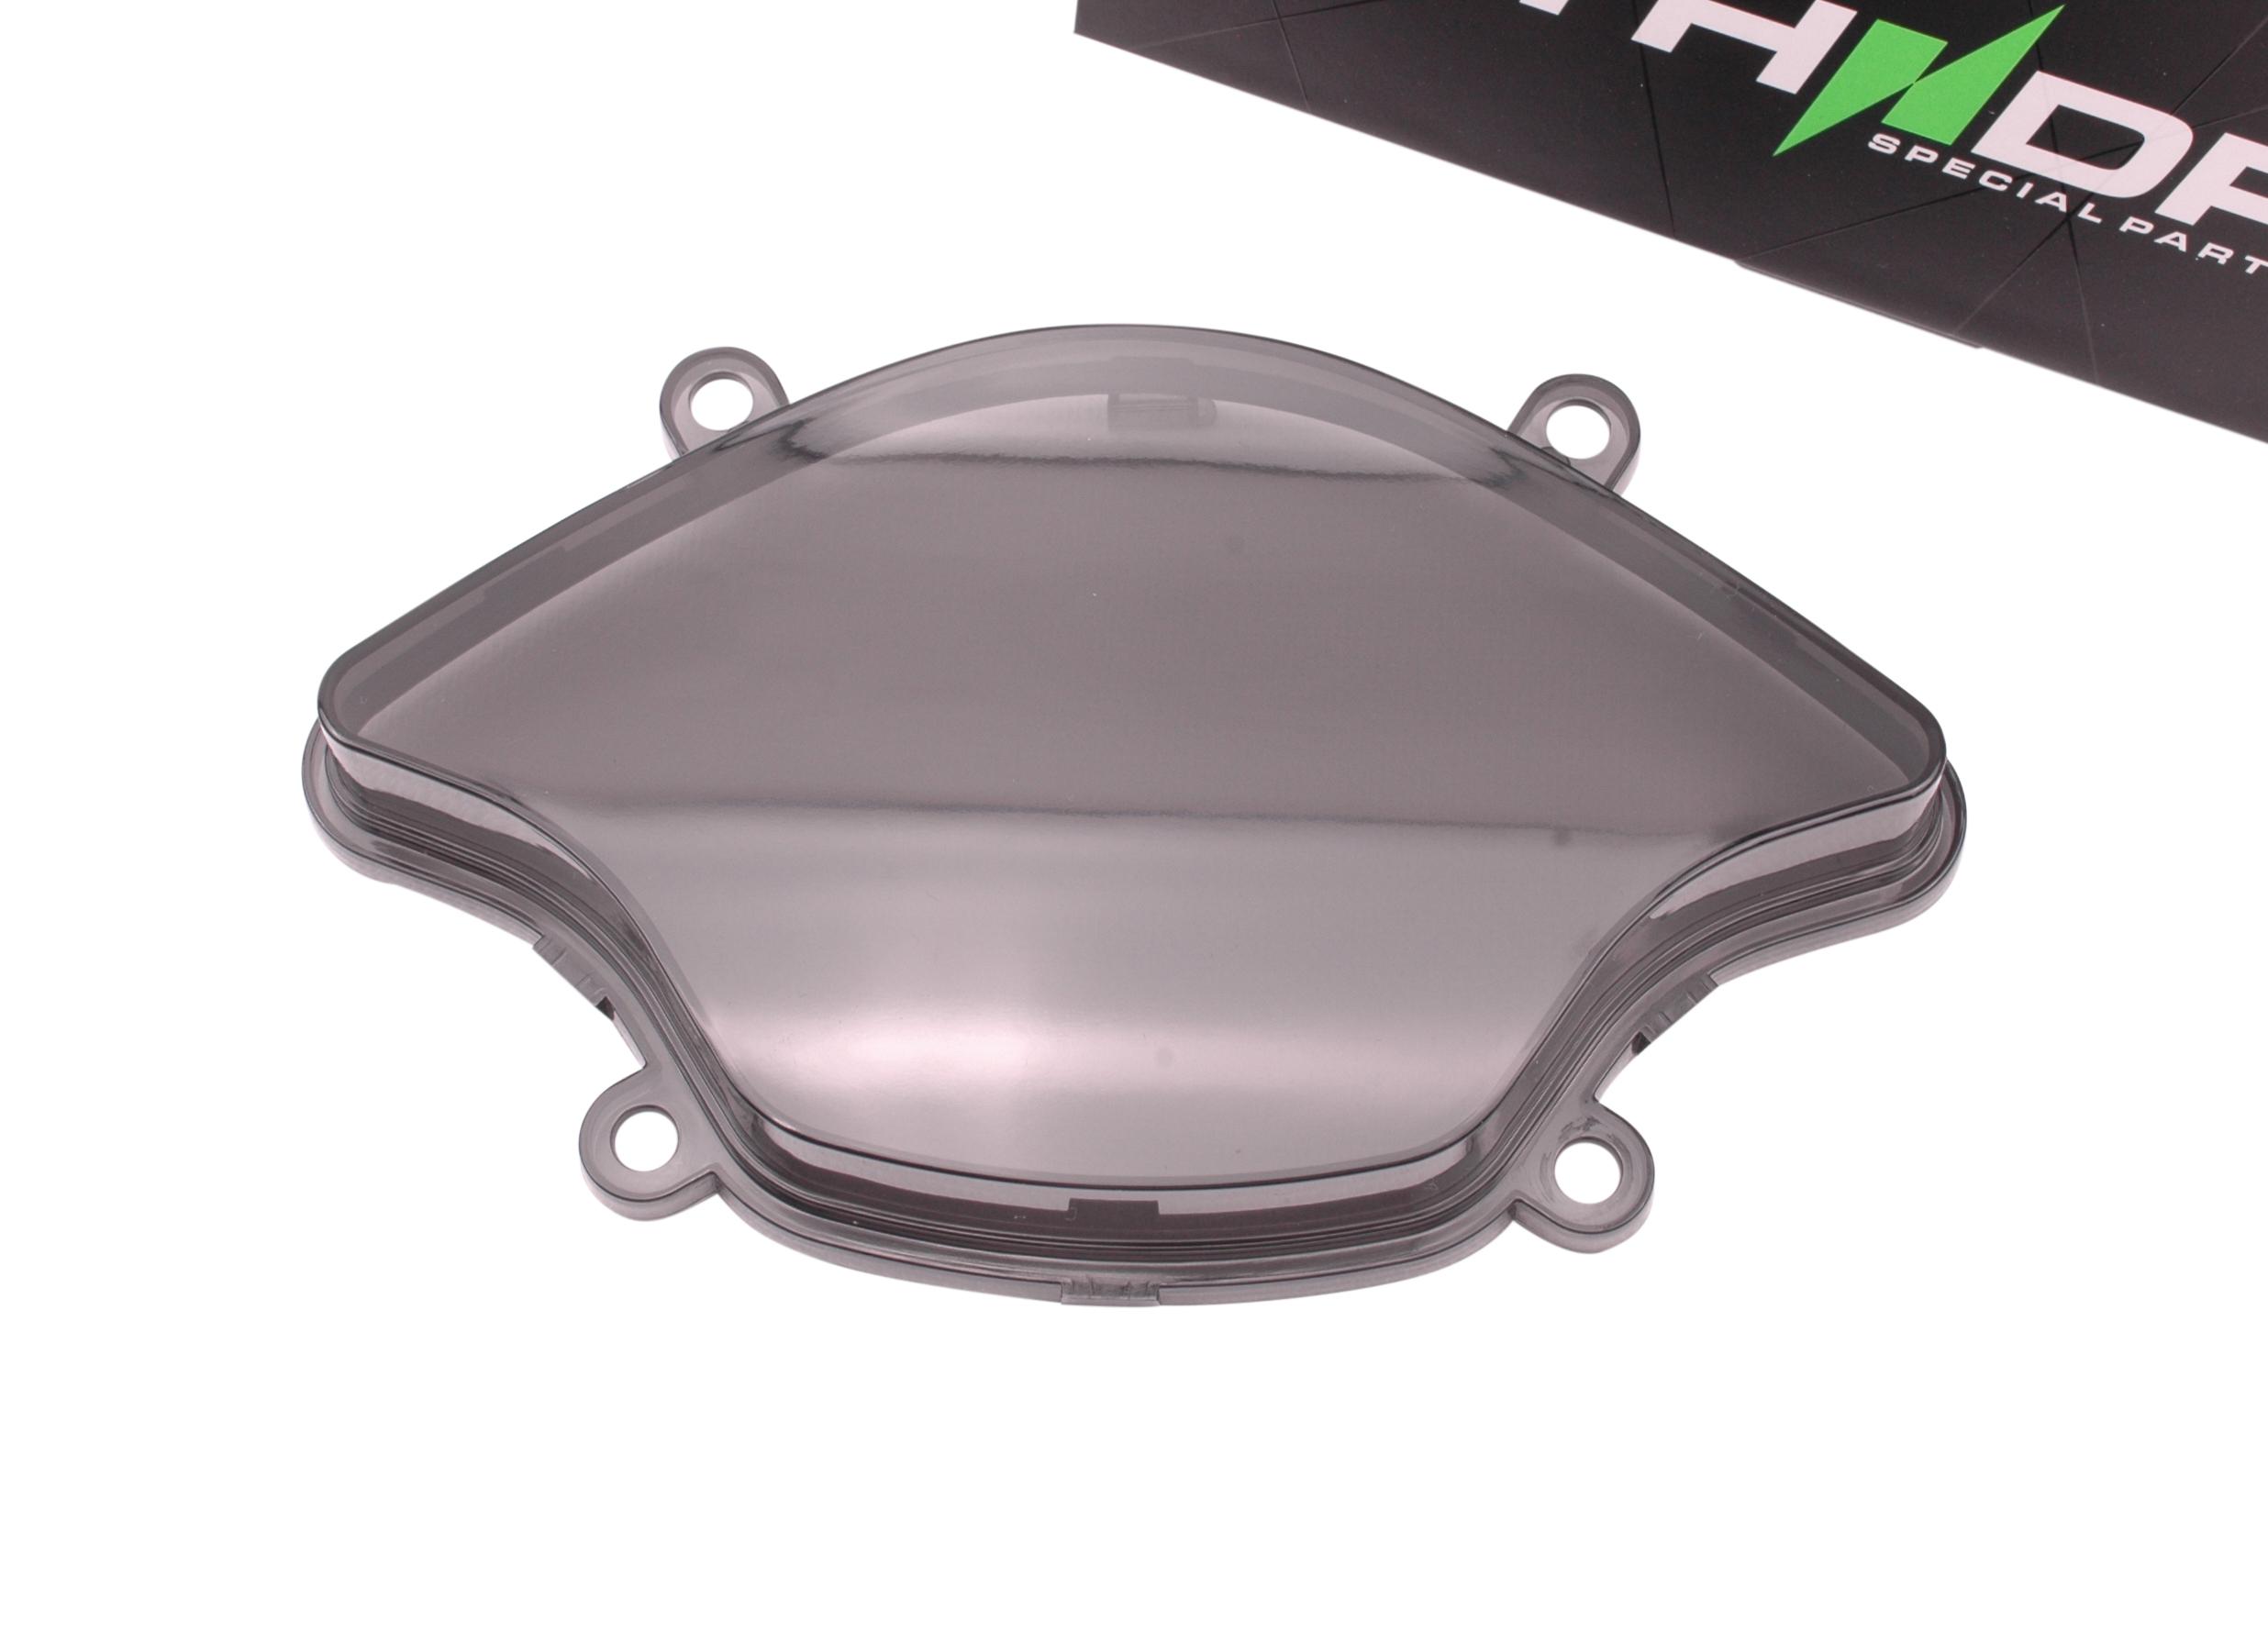 Cockpitglas zwart / smoke / getint zonder extra nokjes (oud model) | Vespa Primavera (-'17) / Sprint (-'17)